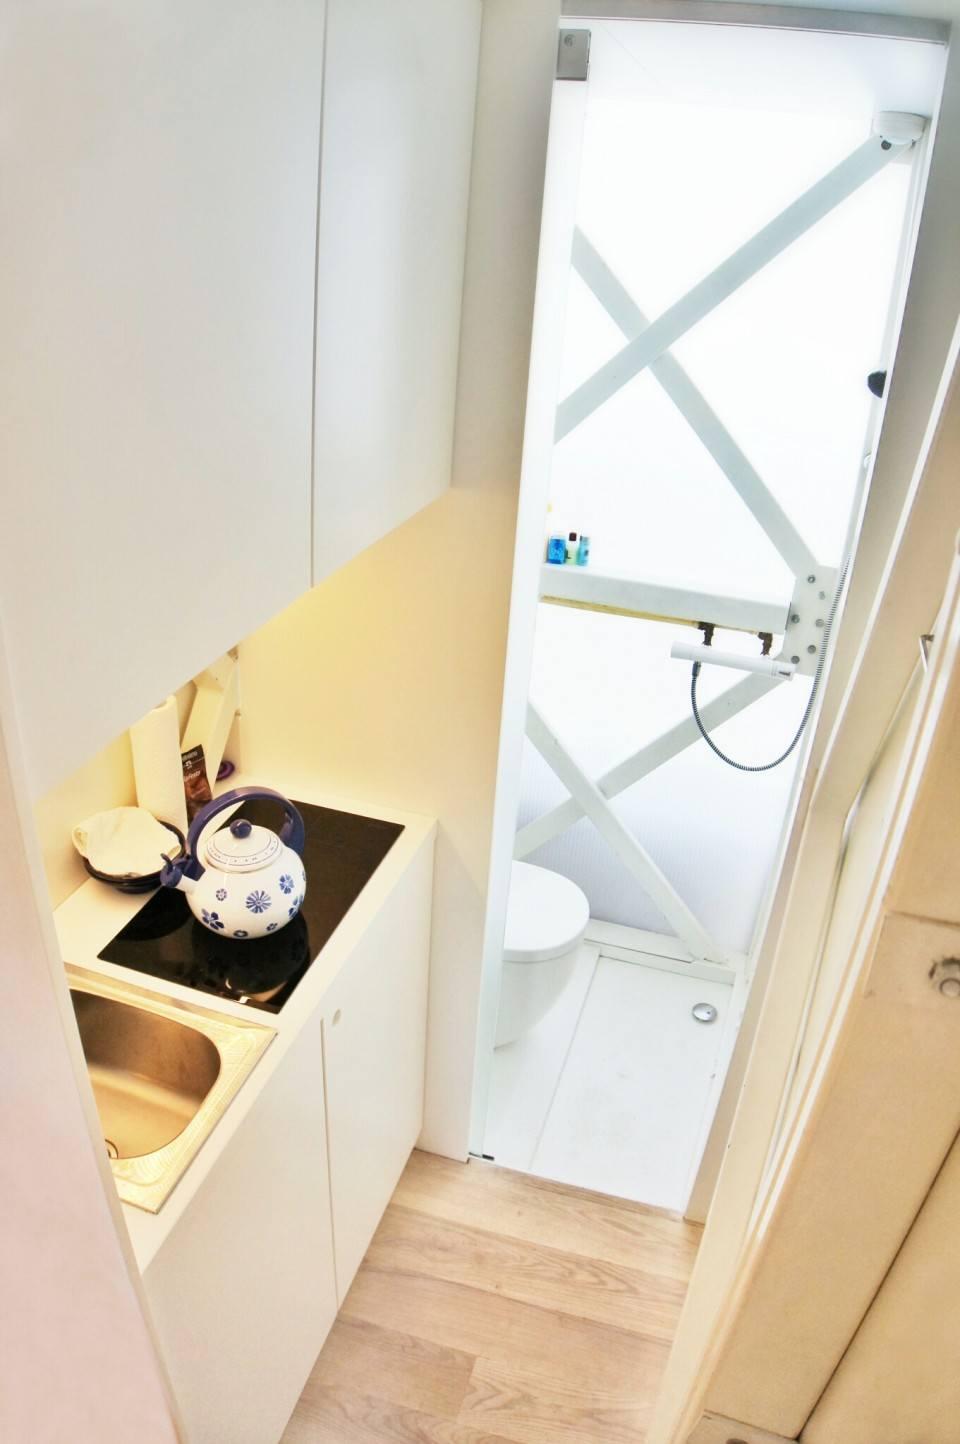 The Kitchen & Bathroom, Keret House, Warsaw, Poland